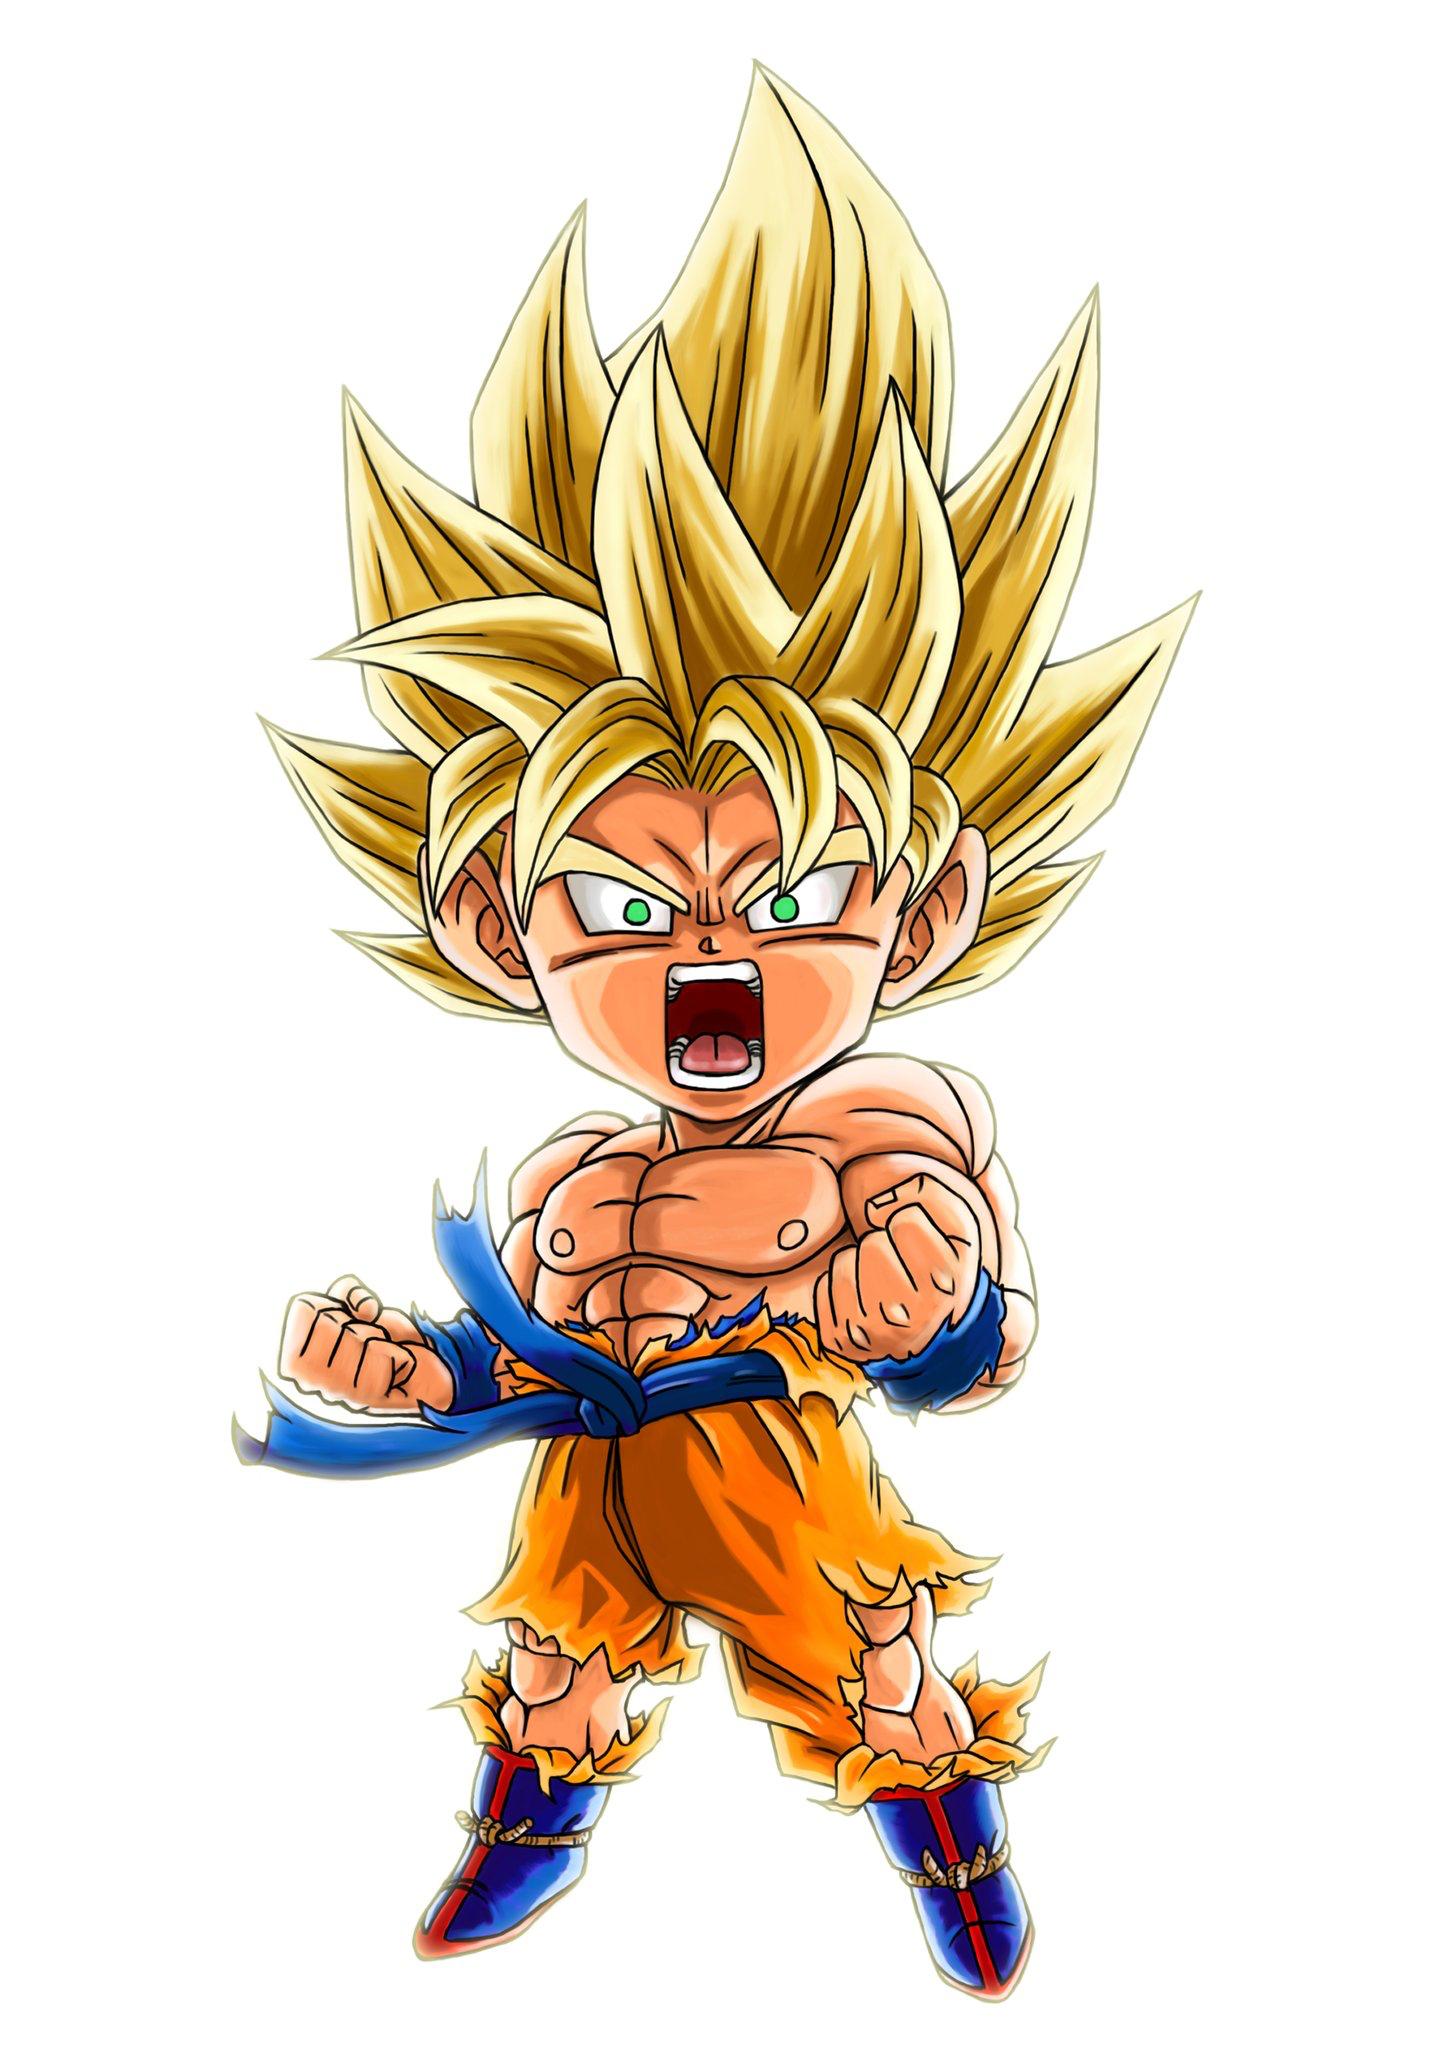 Pin By Uli On Dragonball Z Gt Kai Heroes Super Dragon Ball Super Manga Chibi Dragon Anime Dragon Ball Super